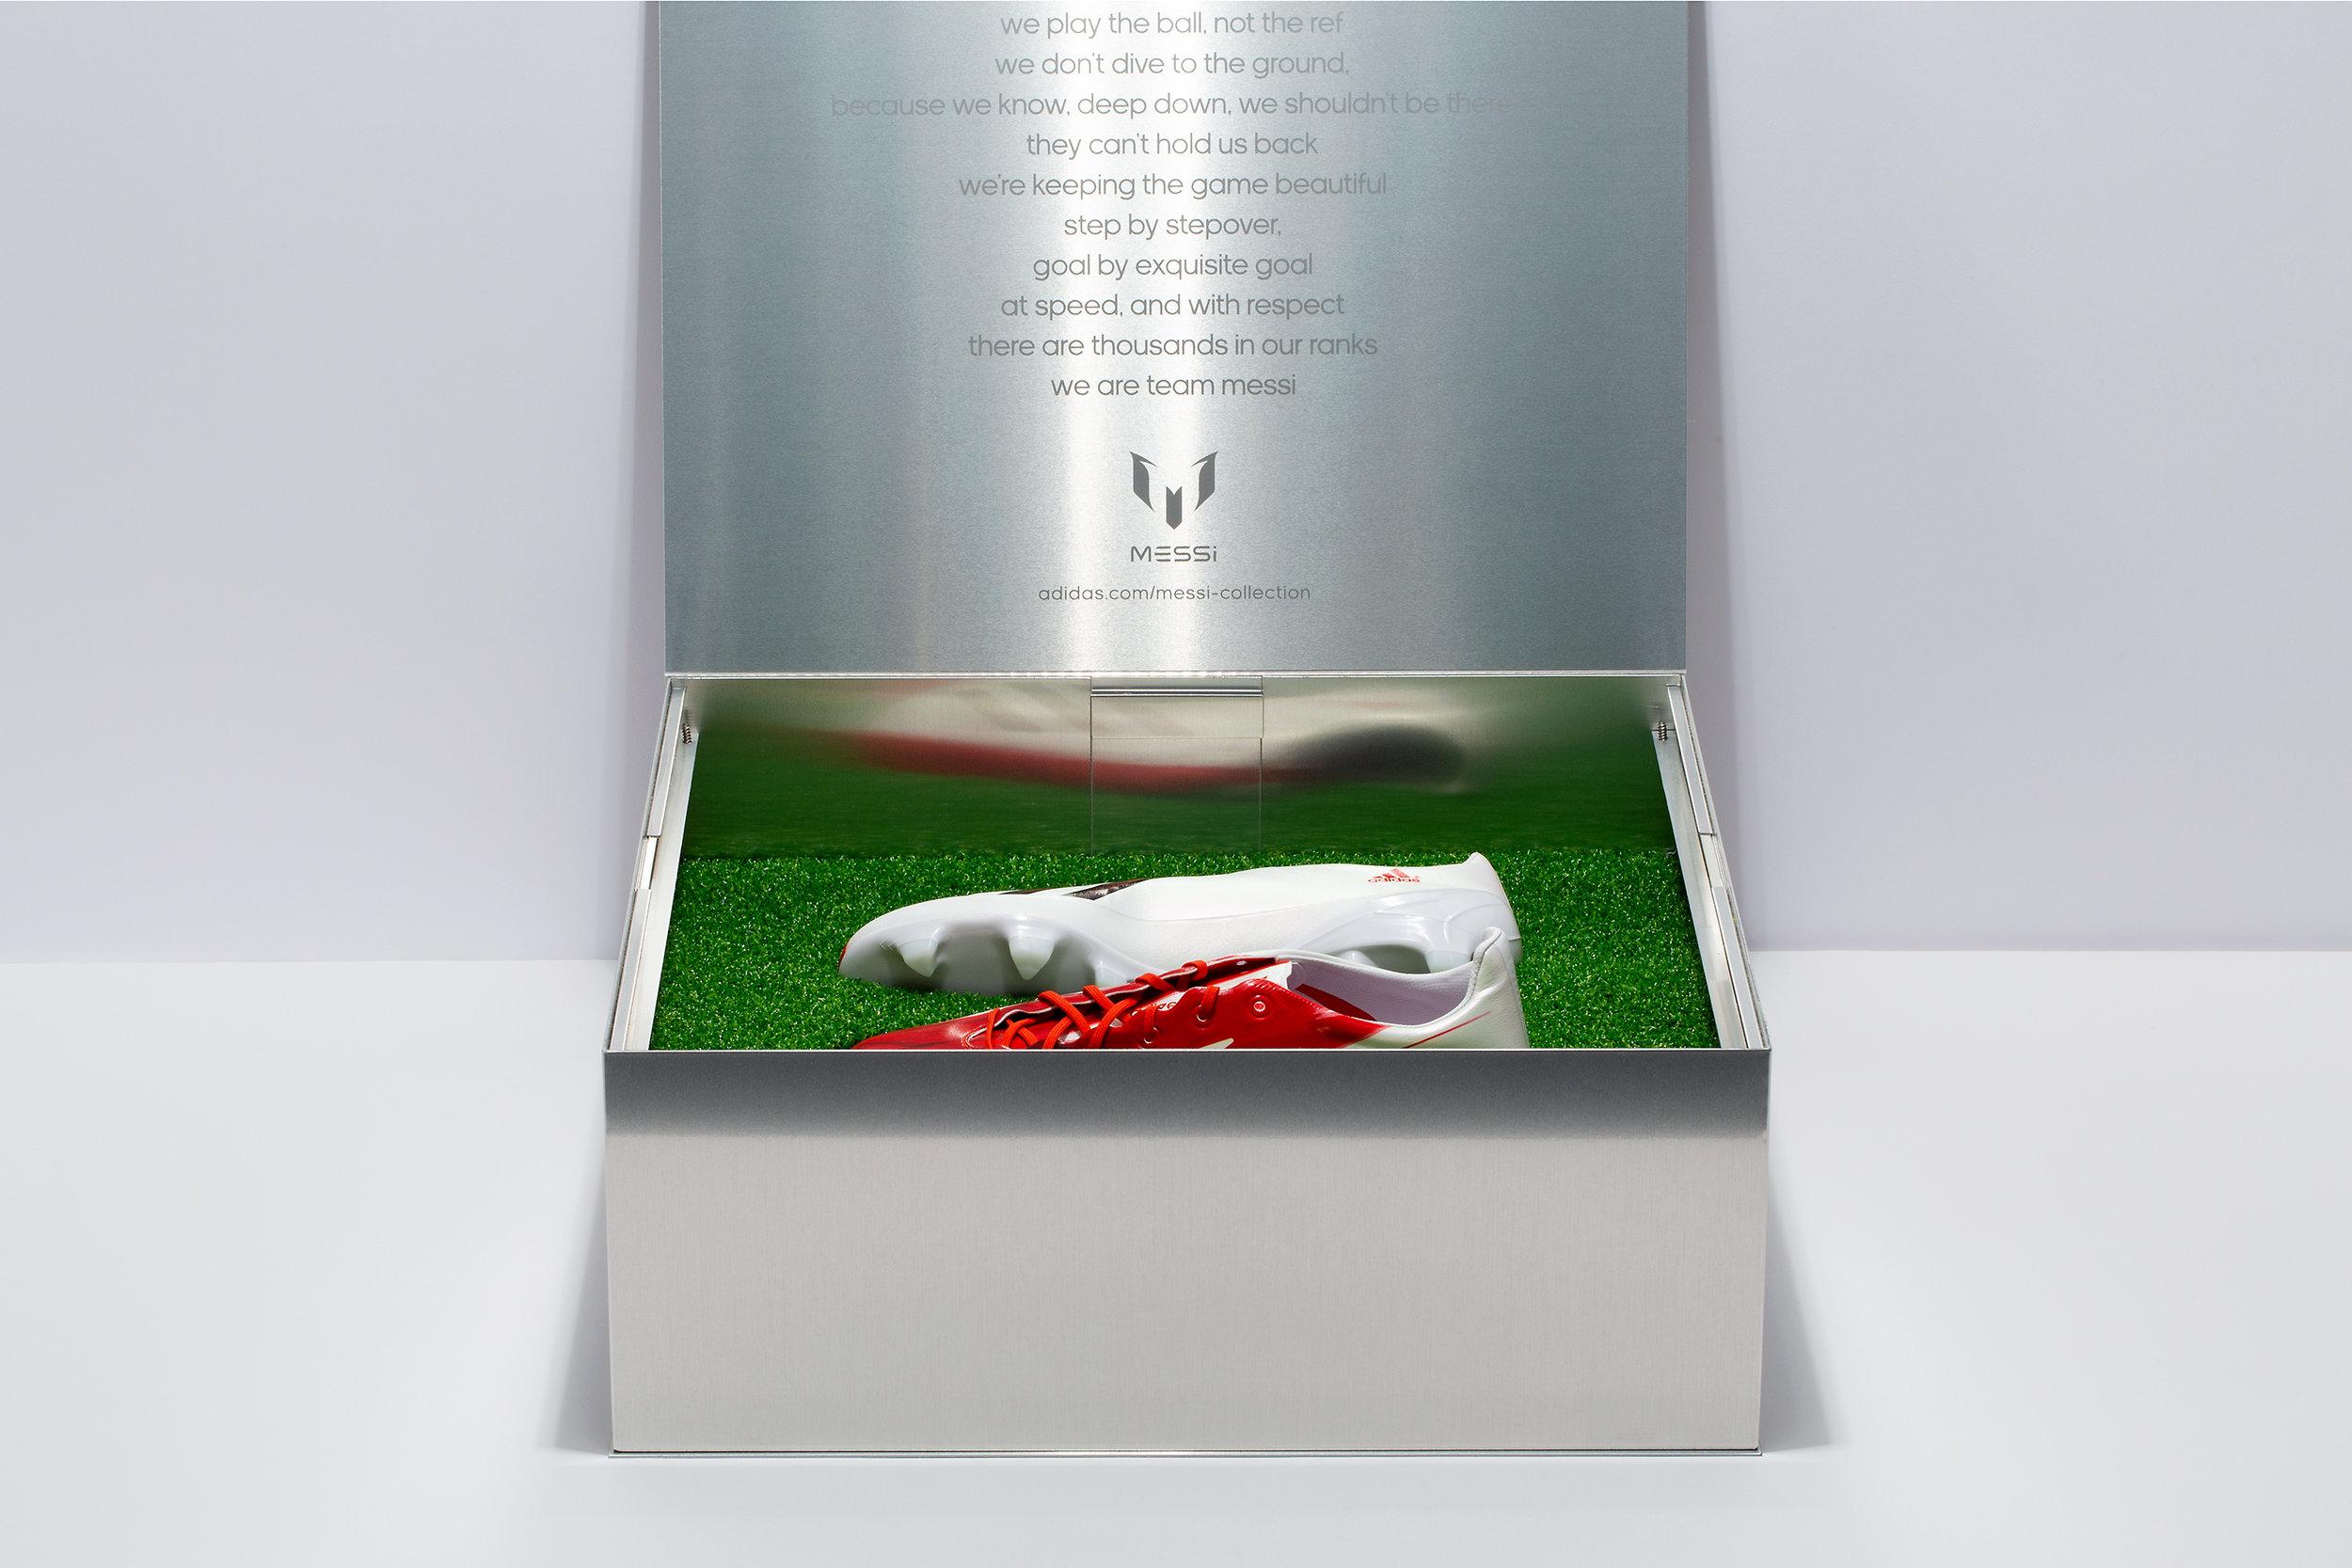 adidas_Messi_box_3.jpg